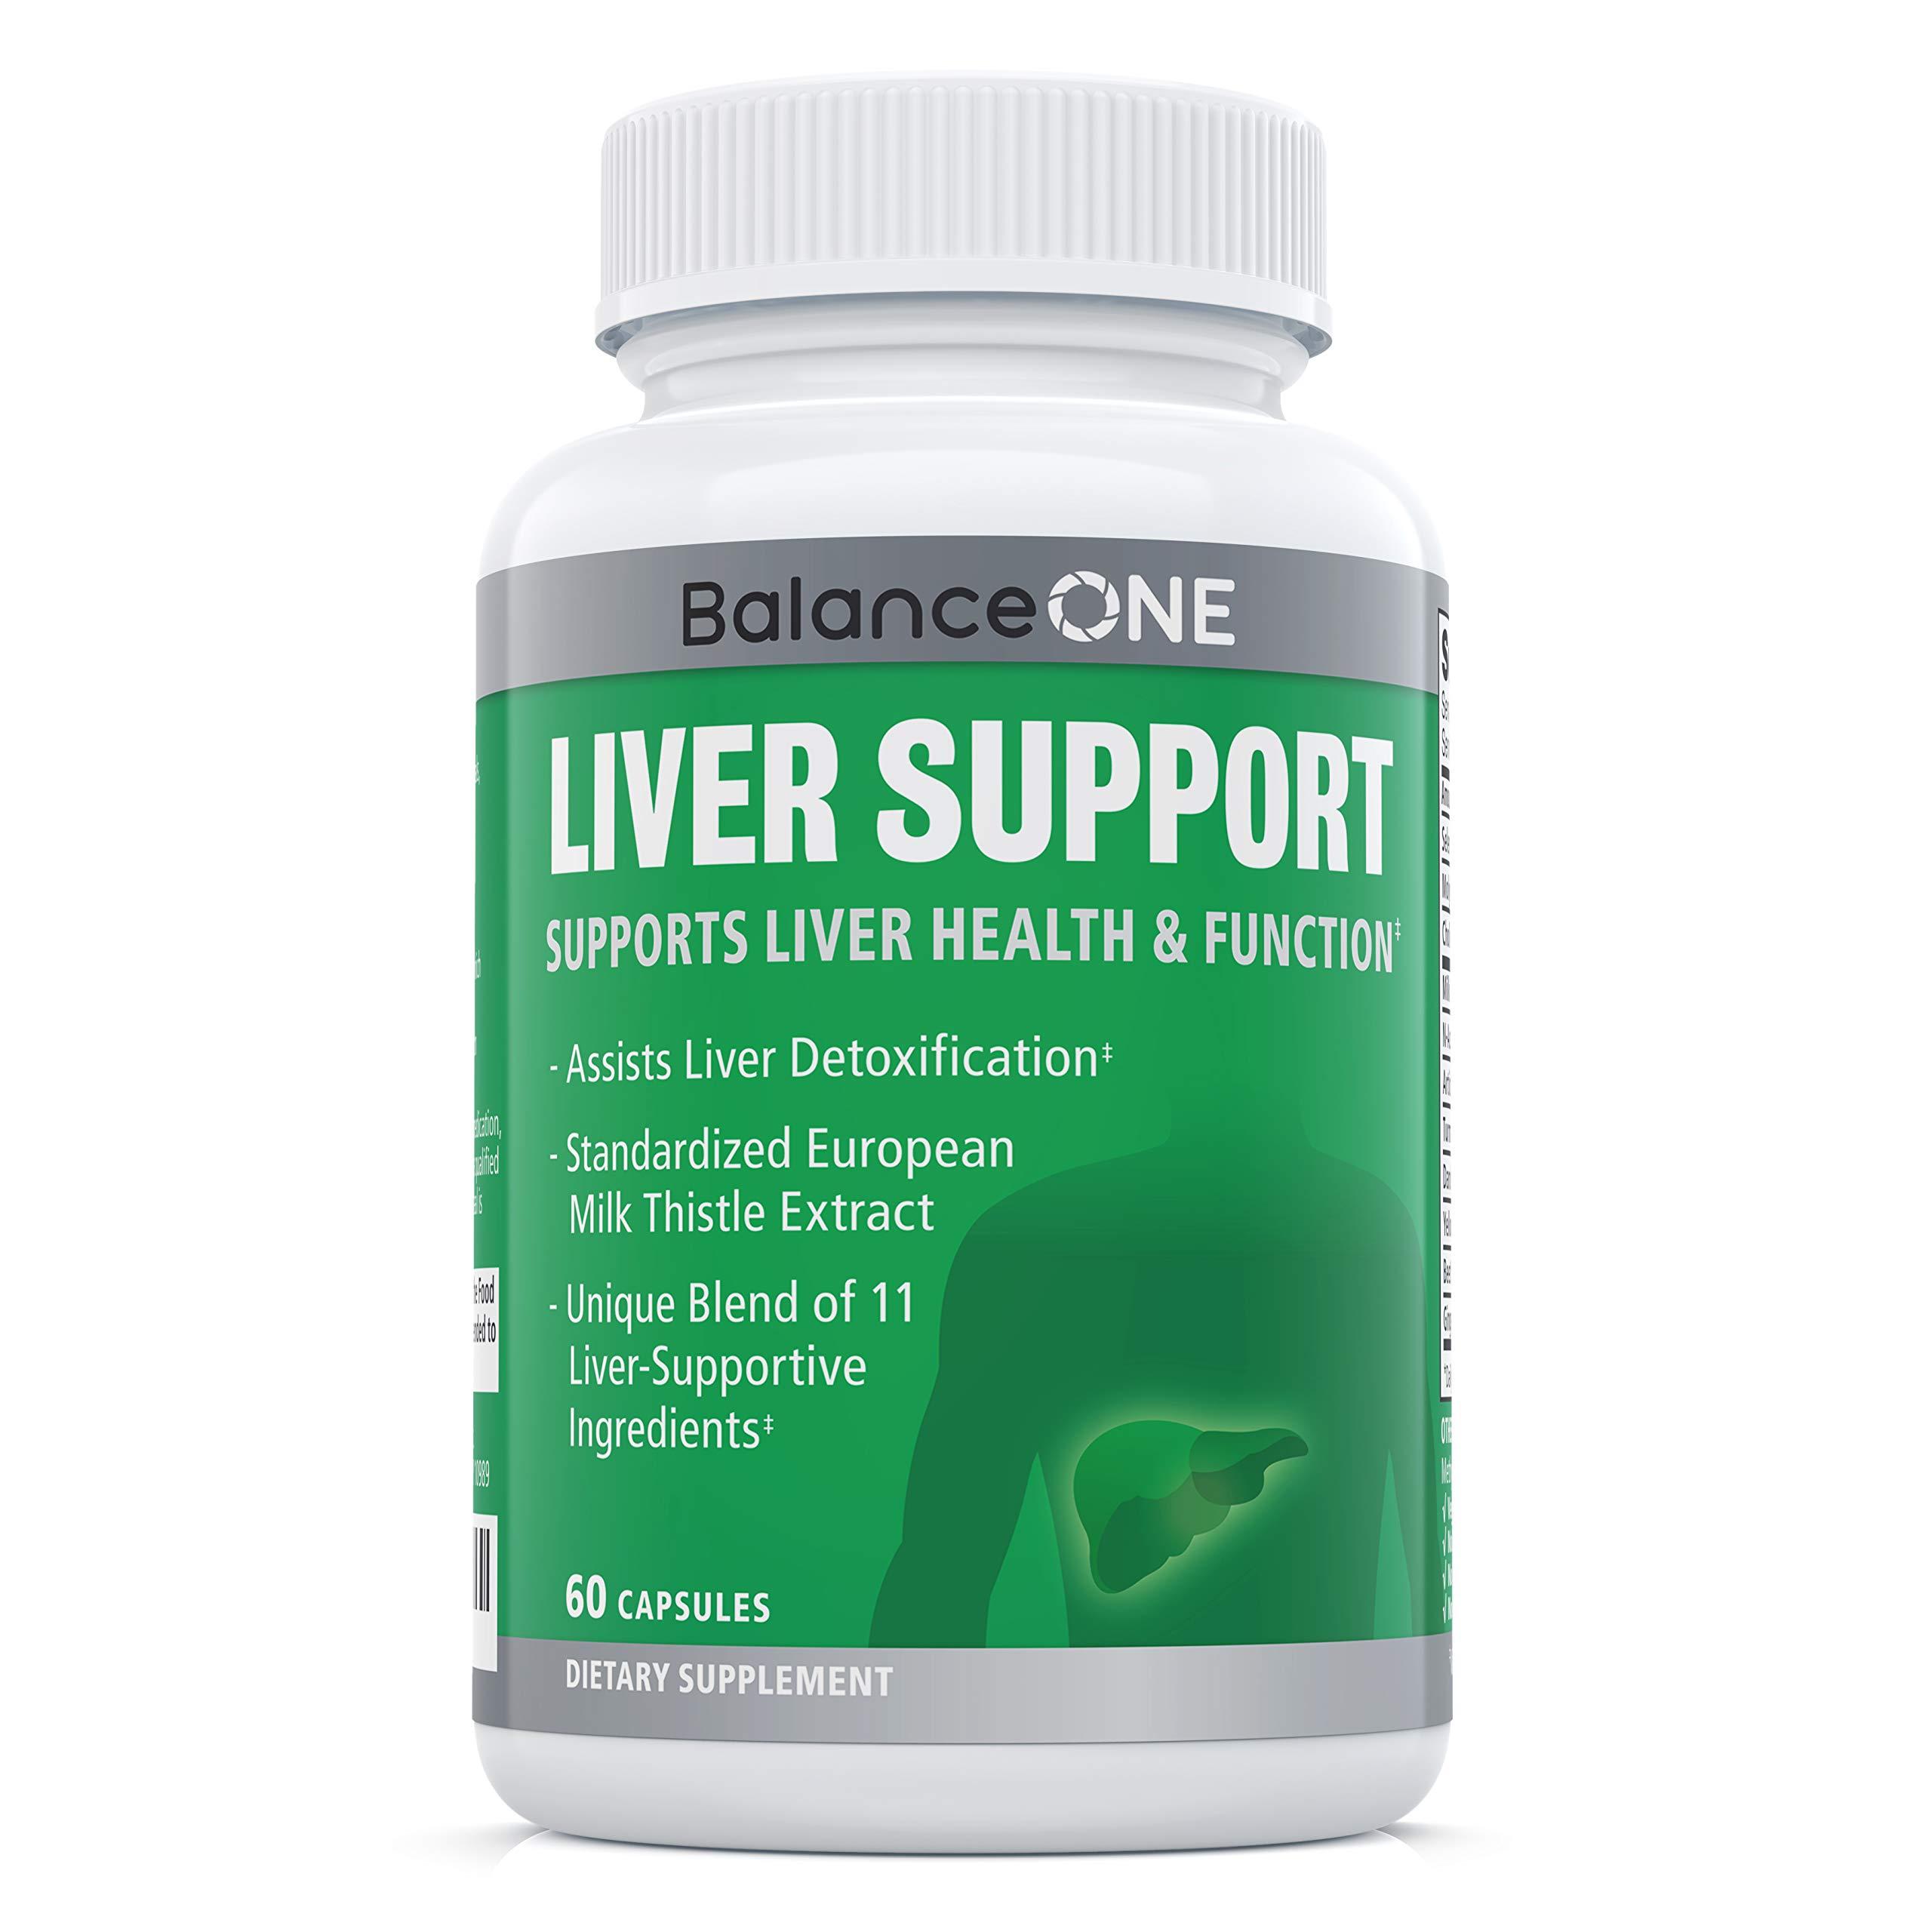 Liver Support by Balance ONE - 11 Antioxidant Ingredients to Promote Liver Health - Milk Thistle, Molybdenum, Dandelion, Artichoke - Vegan, Non-GMO - 30 Day Supply